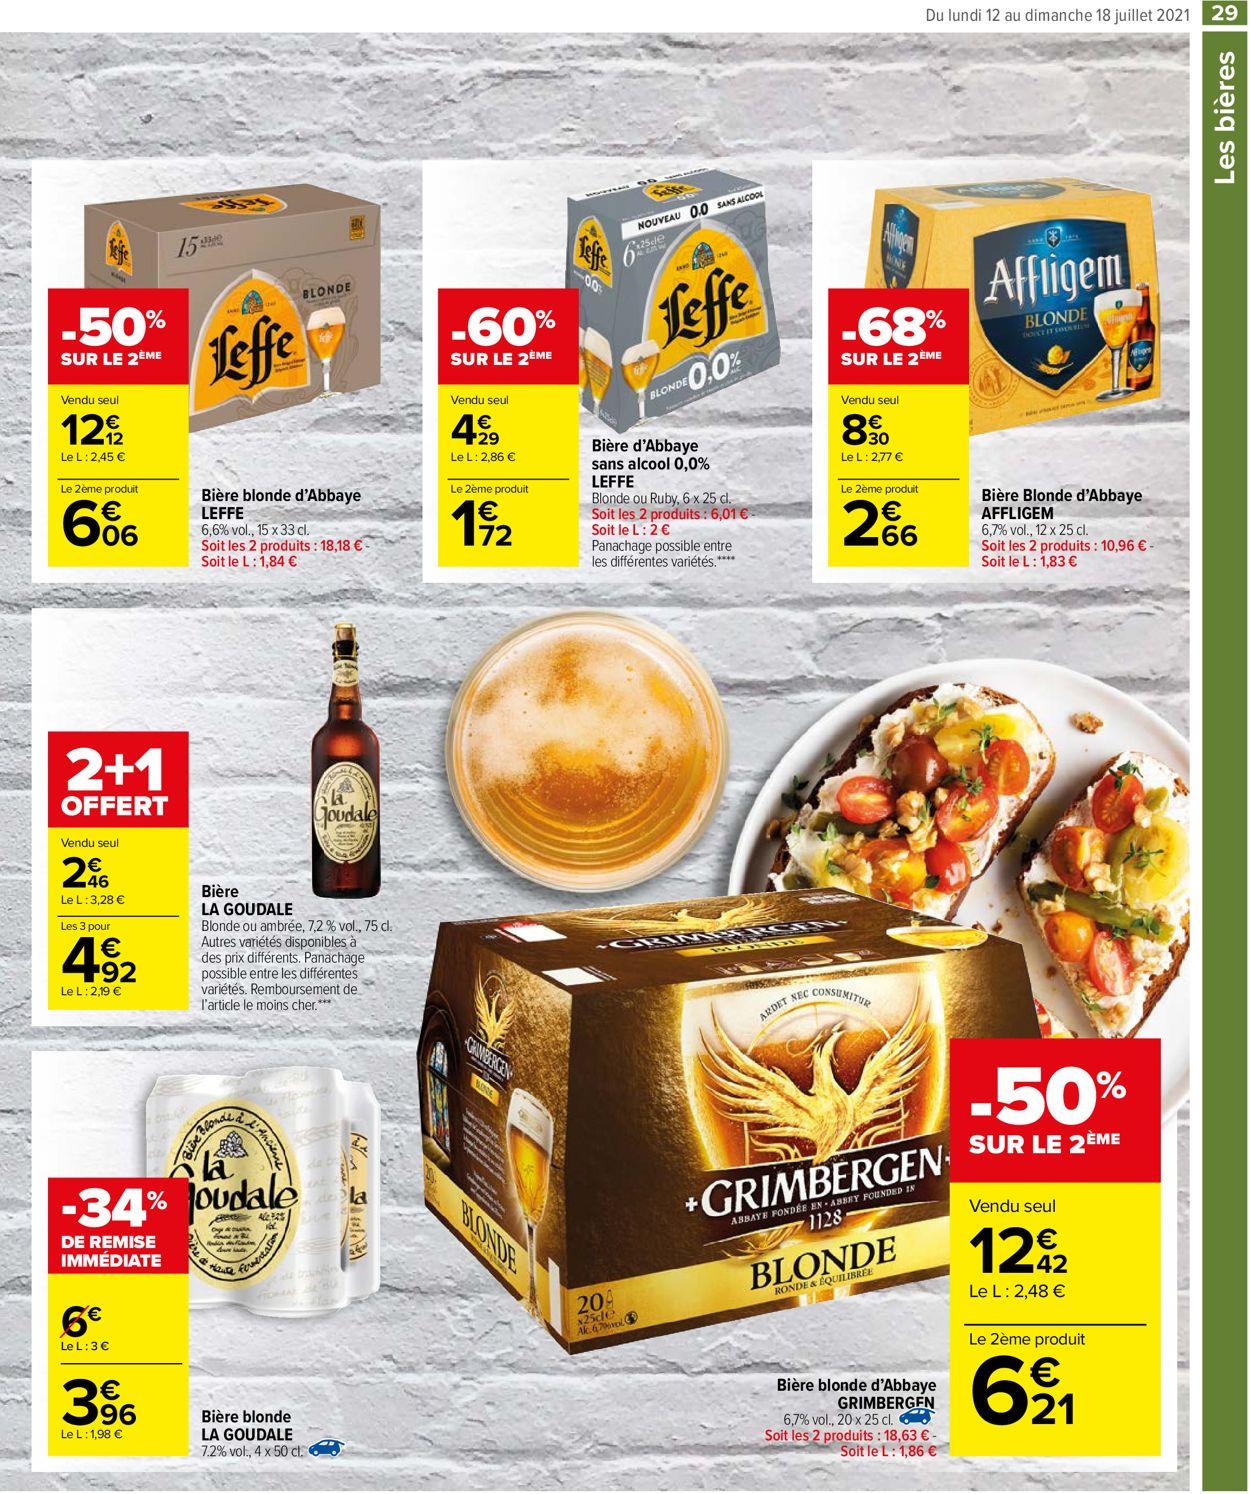 Carrefour Catalogue - 12.07-18.07.2021 (Page 29)